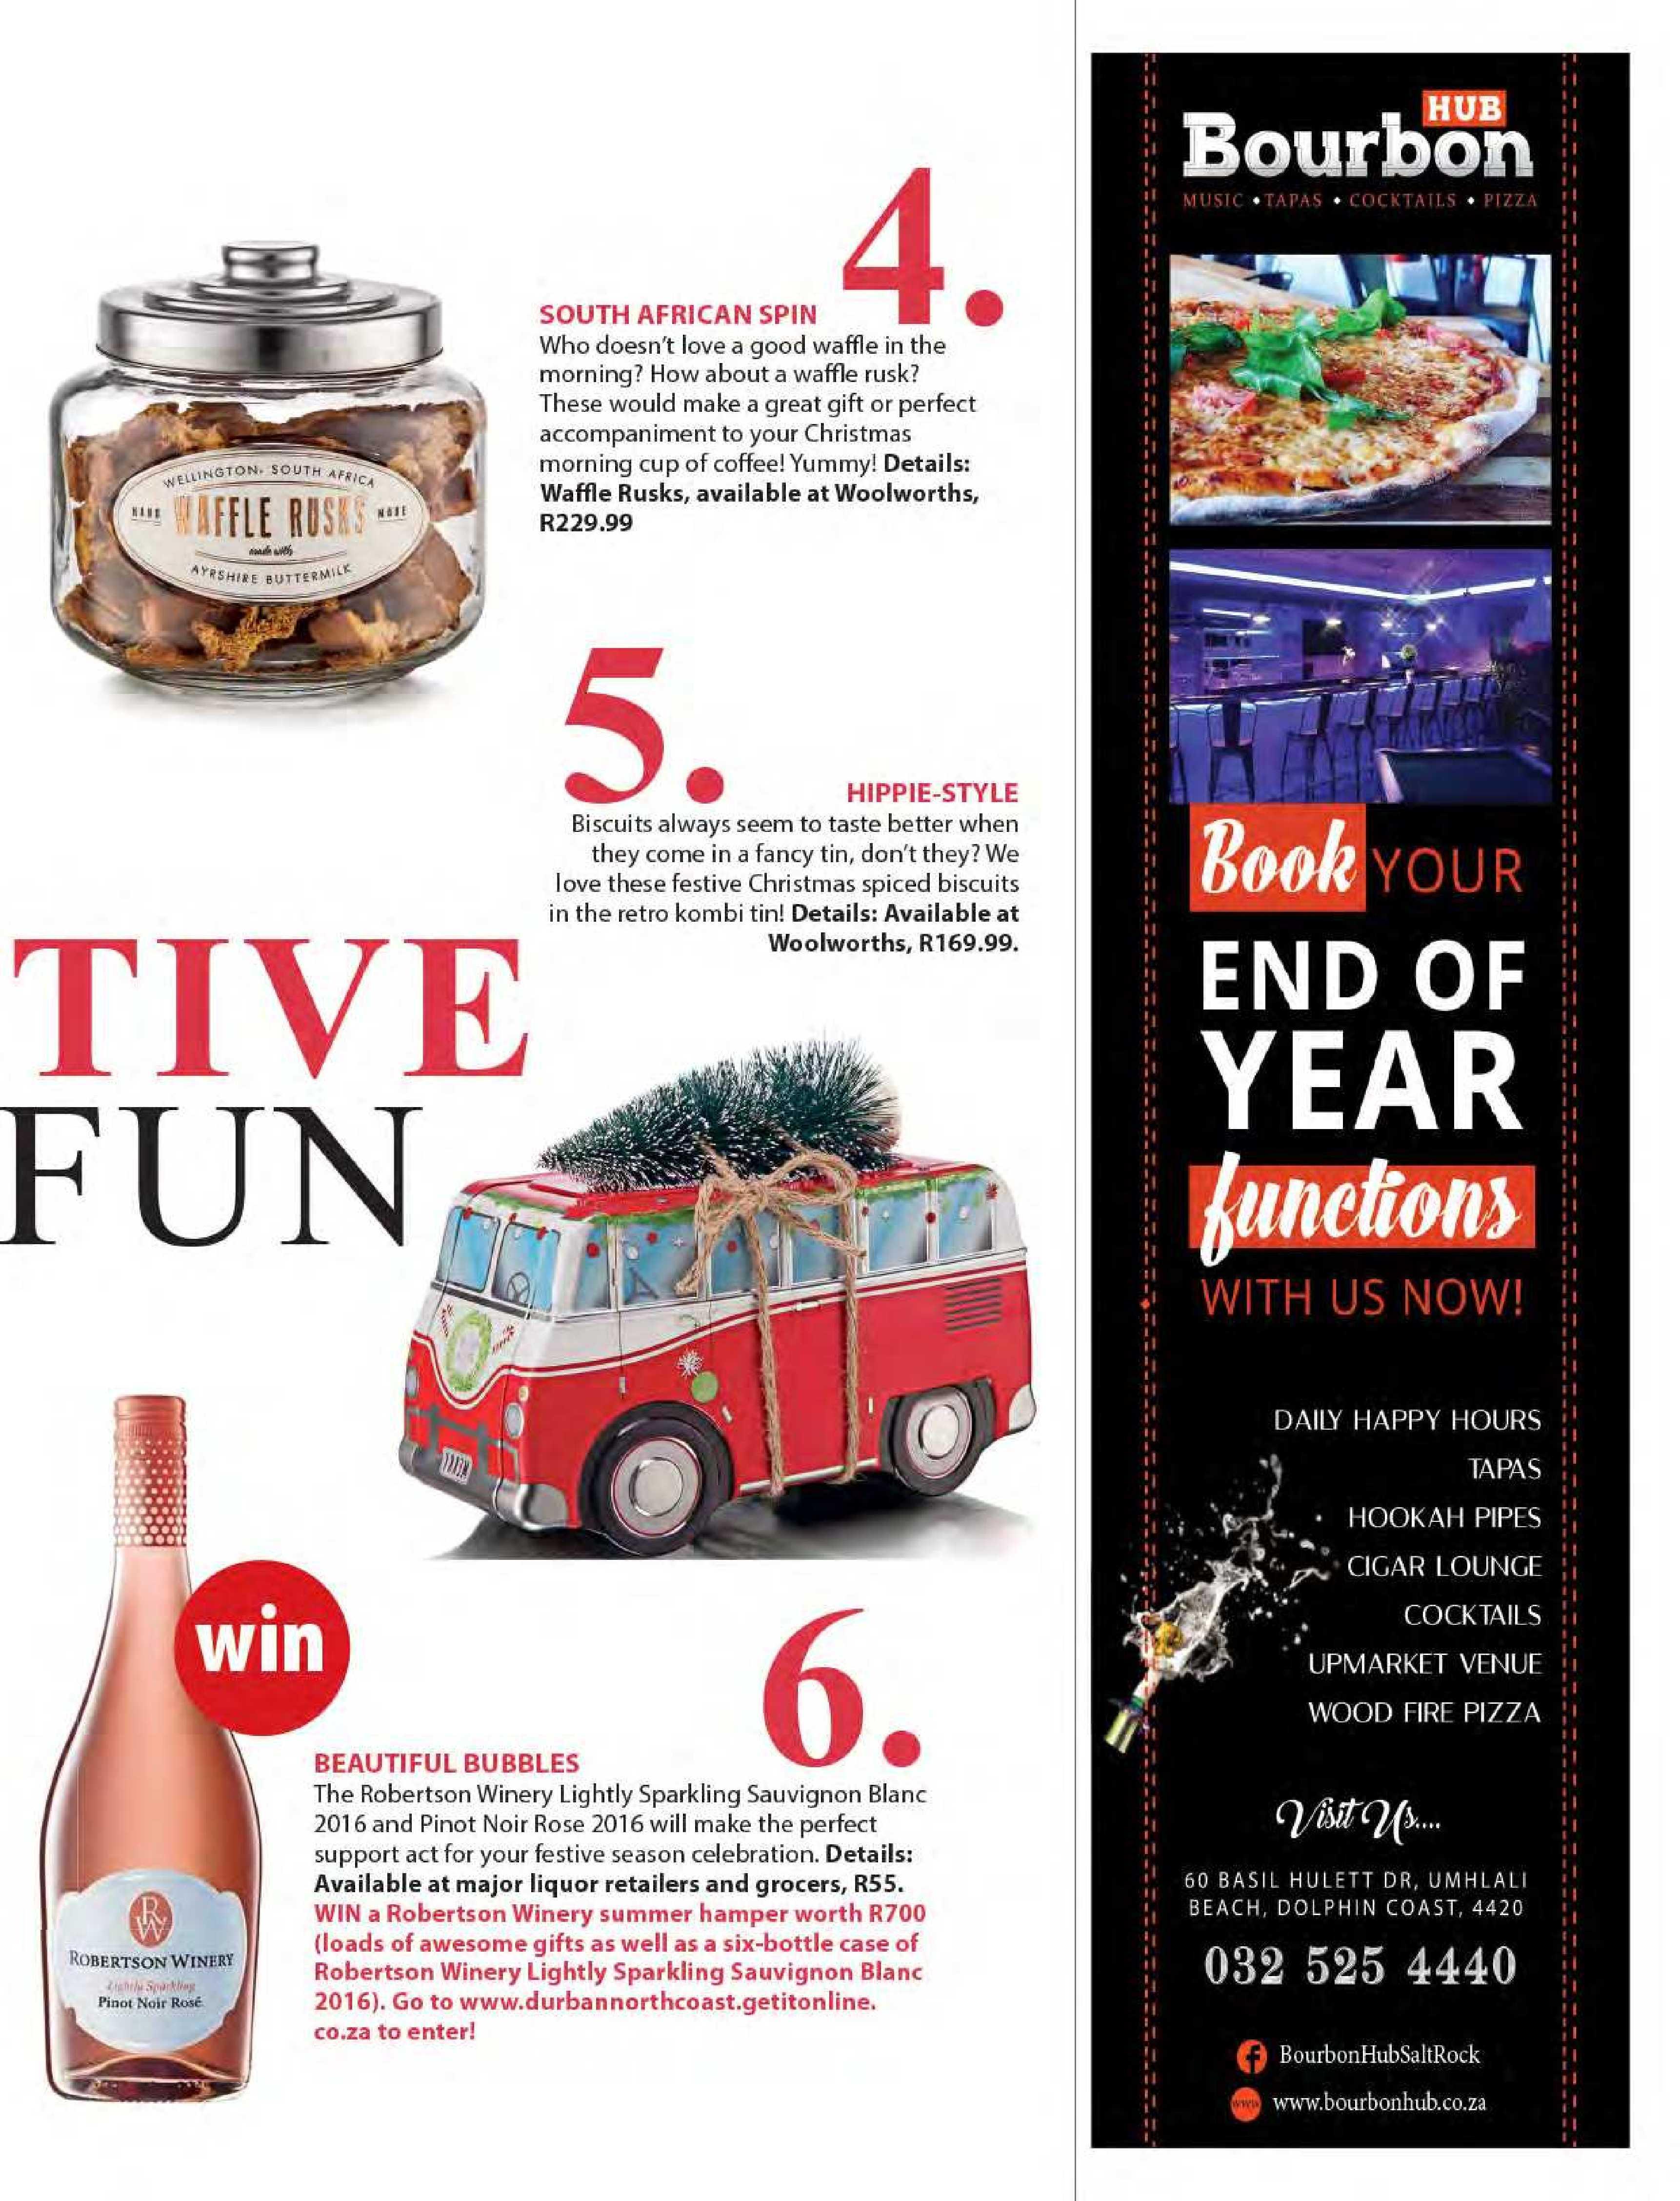 get-magazine-ballitoumhlanga-december-2017-january-2018-2-epapers-page-67